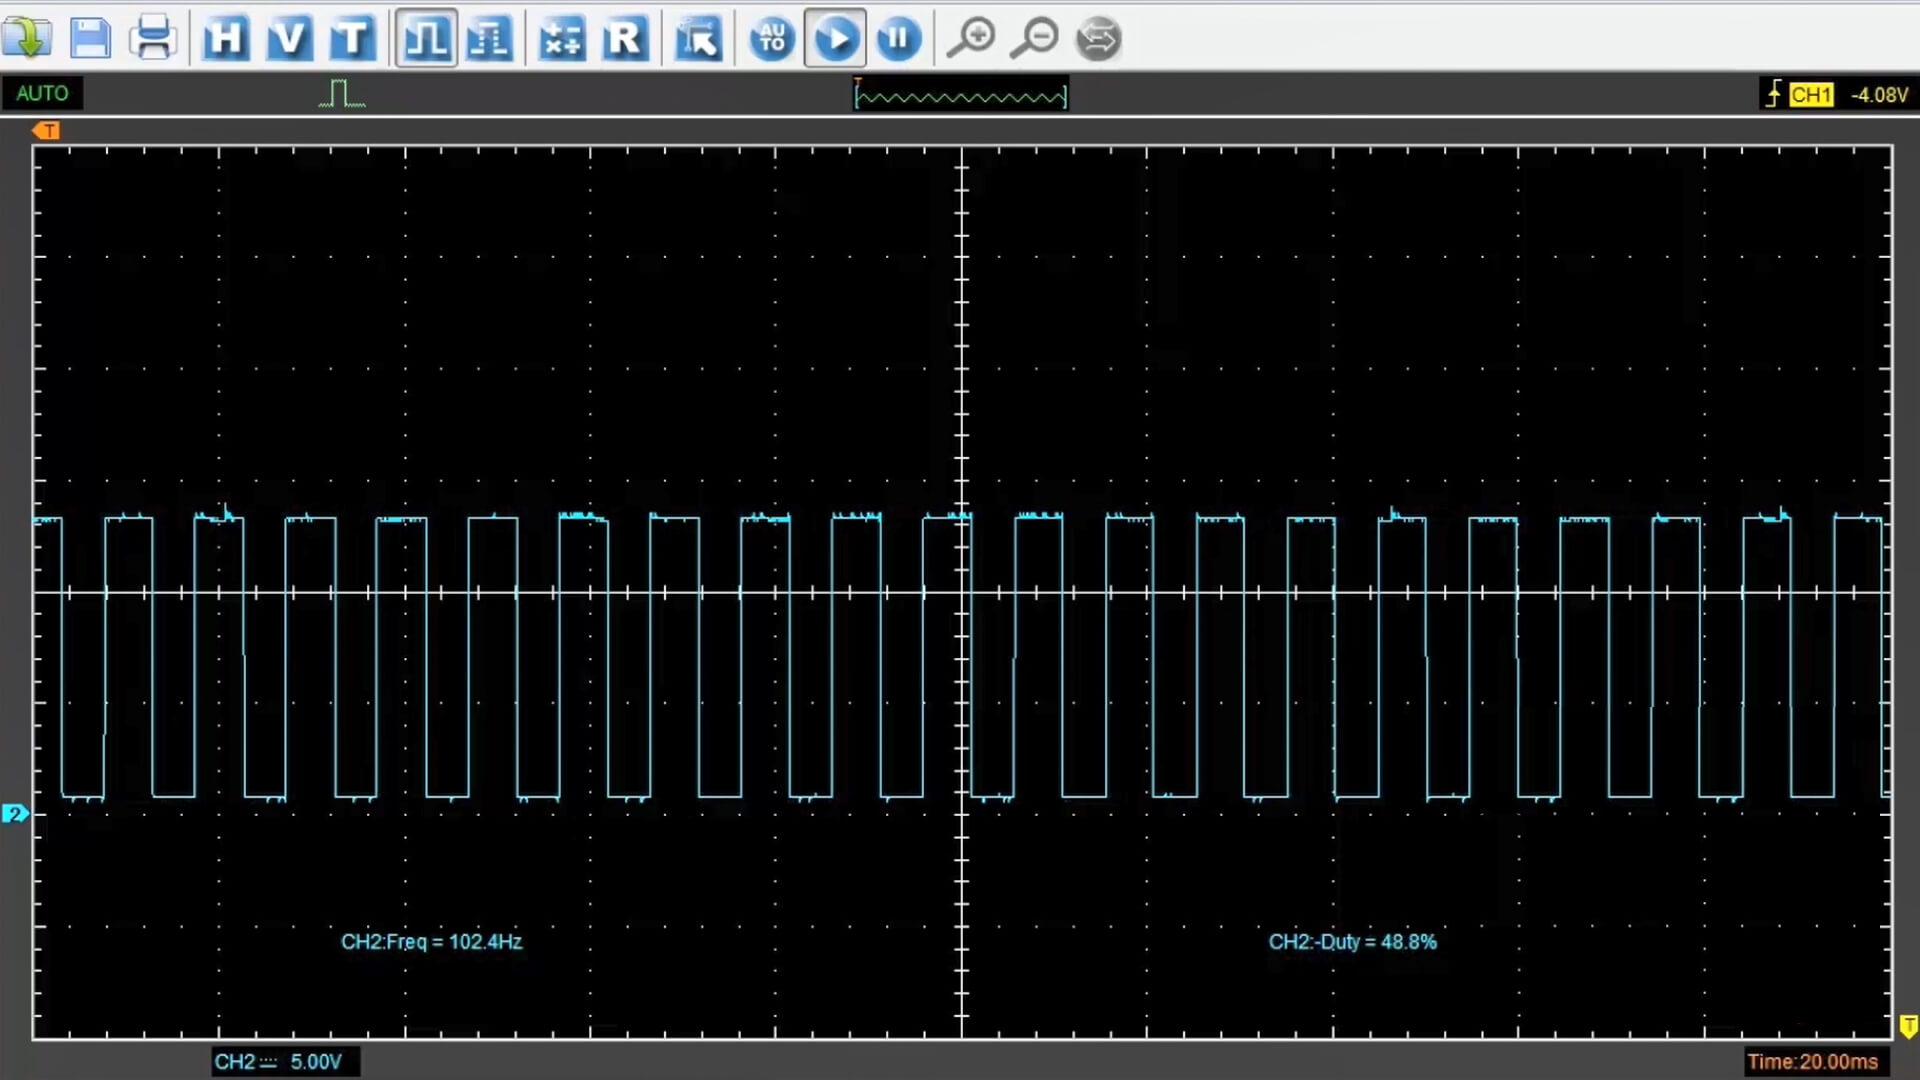 sonda-lambda-banda-larga-teste-controle-aquecedor-3